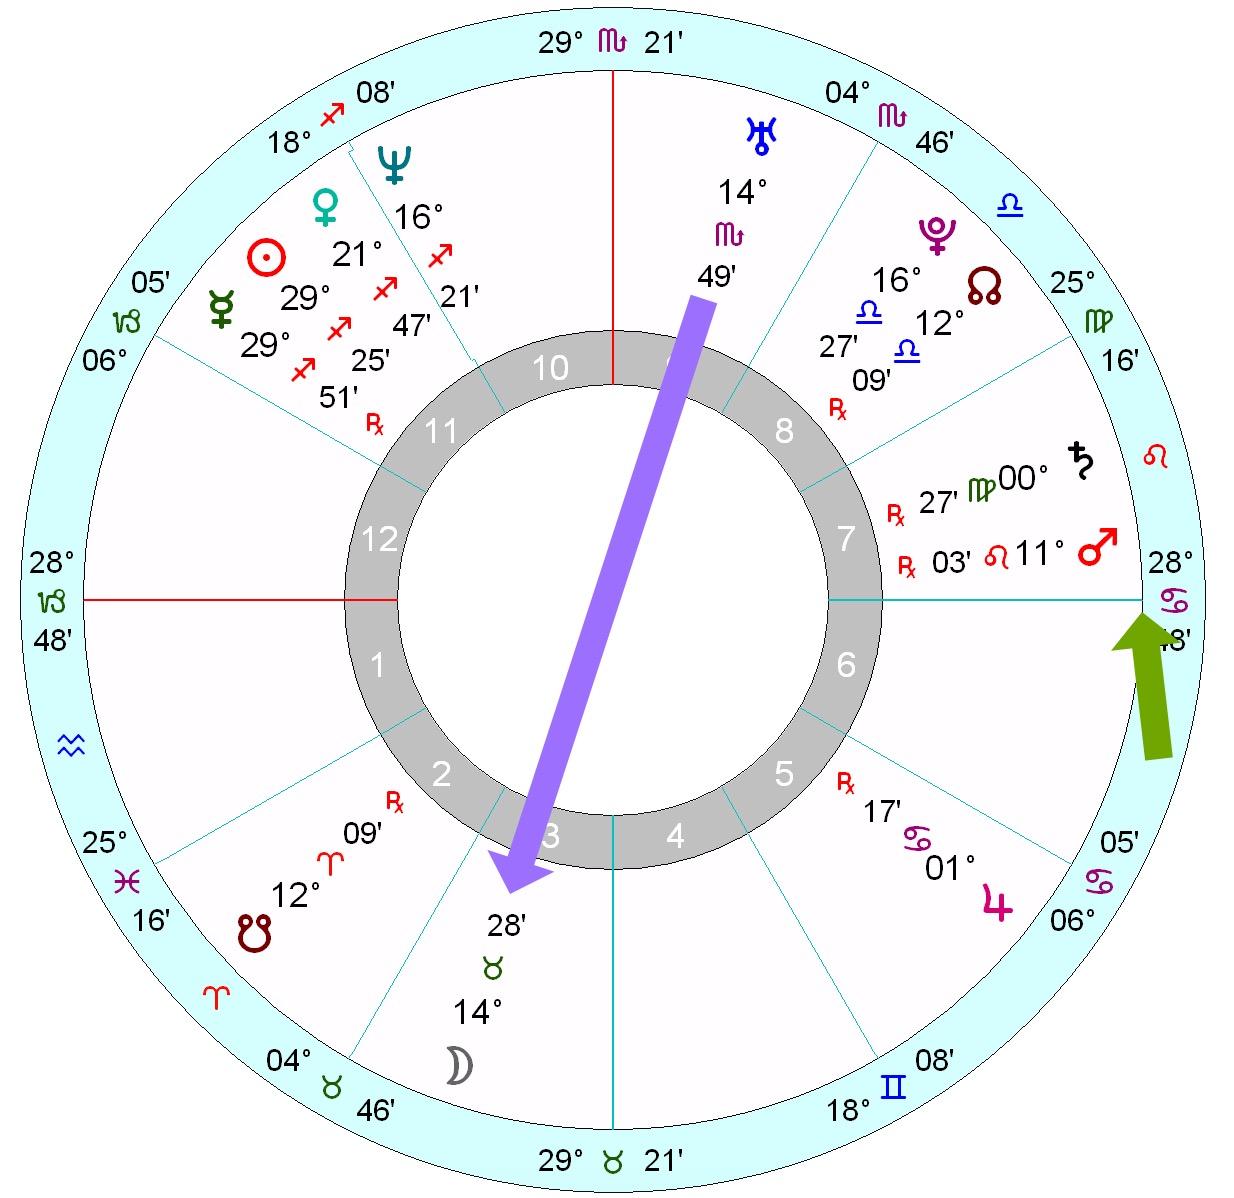 Emmanuel Macron's horoscope | Astrology School